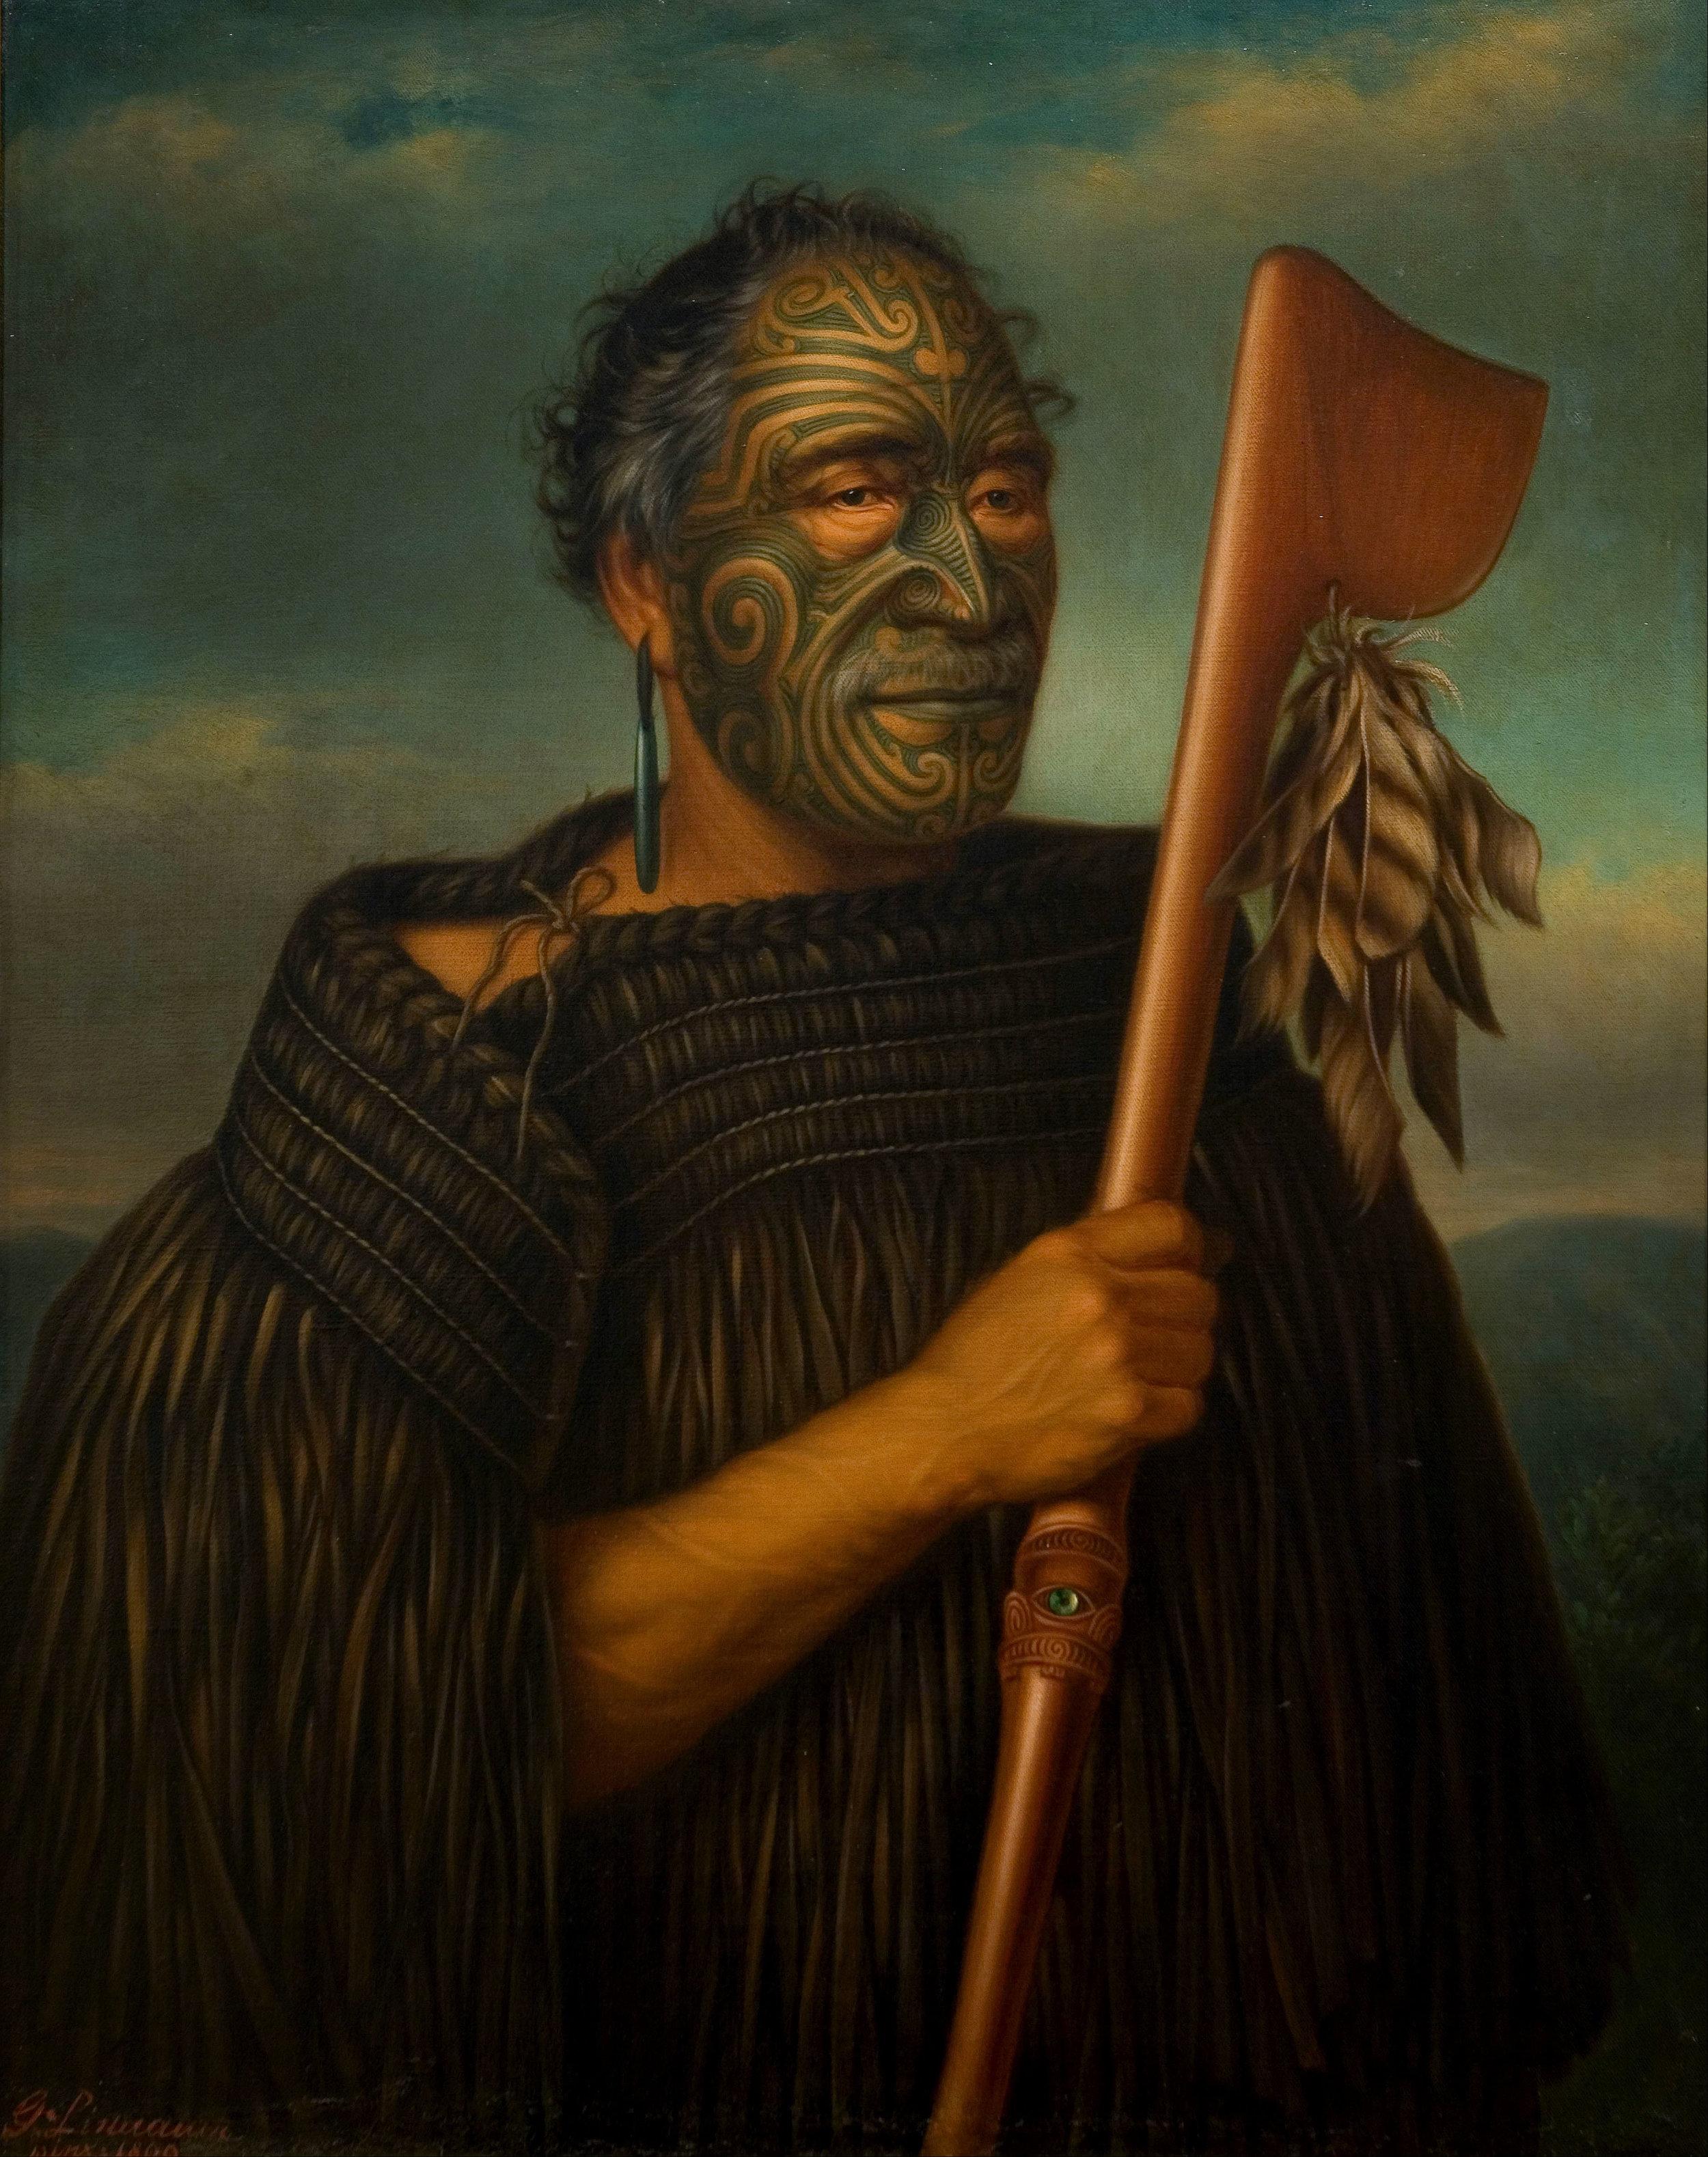 Gottfried Lindauer, 'Tamati Waka Nene,' 1890. Oil on canvas. Auckland Art Gallery Toi o Tāmaki